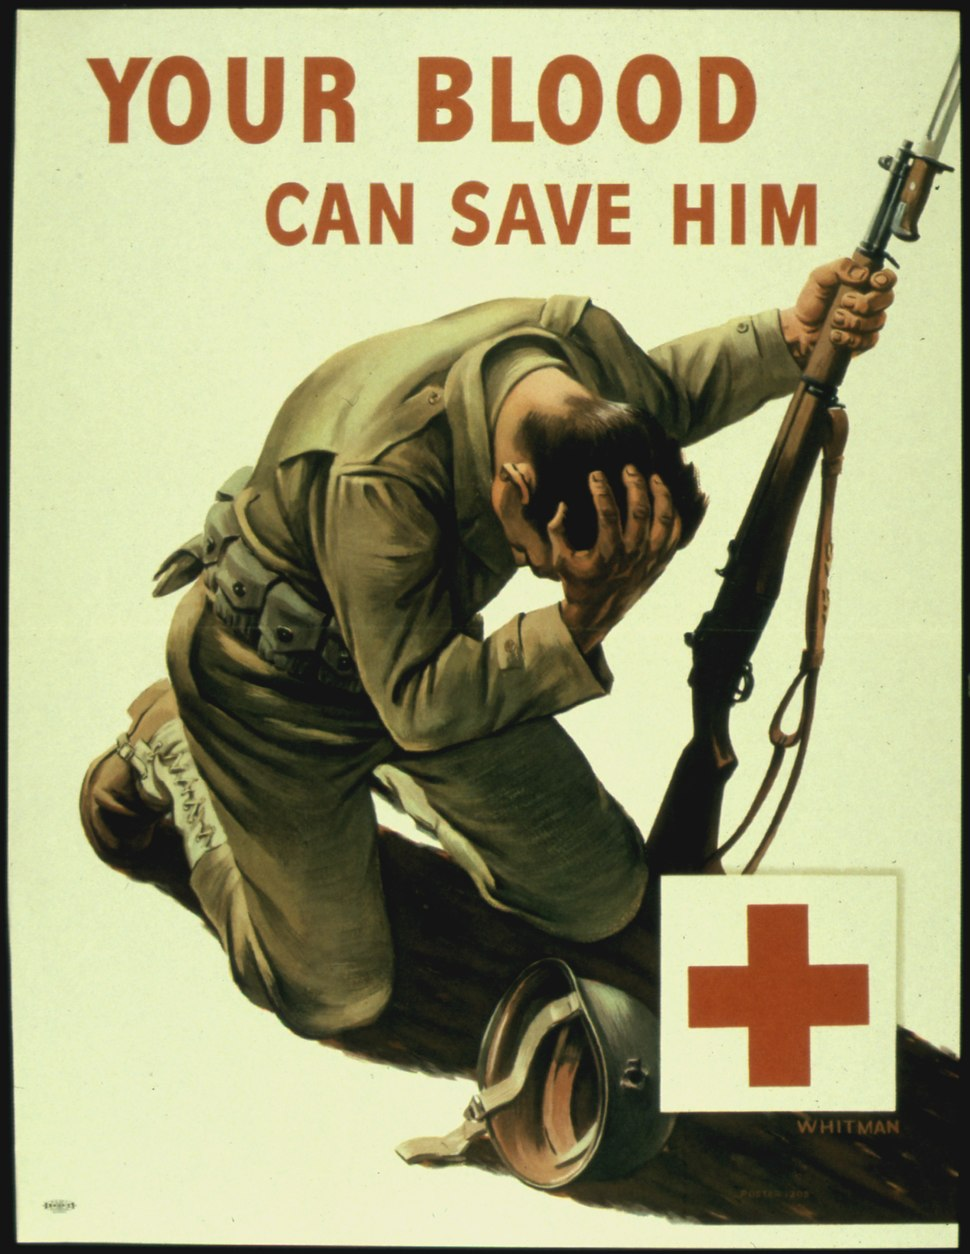 """YOUR BLOOD CAN SAVE HIM"" - NARA - 516245"